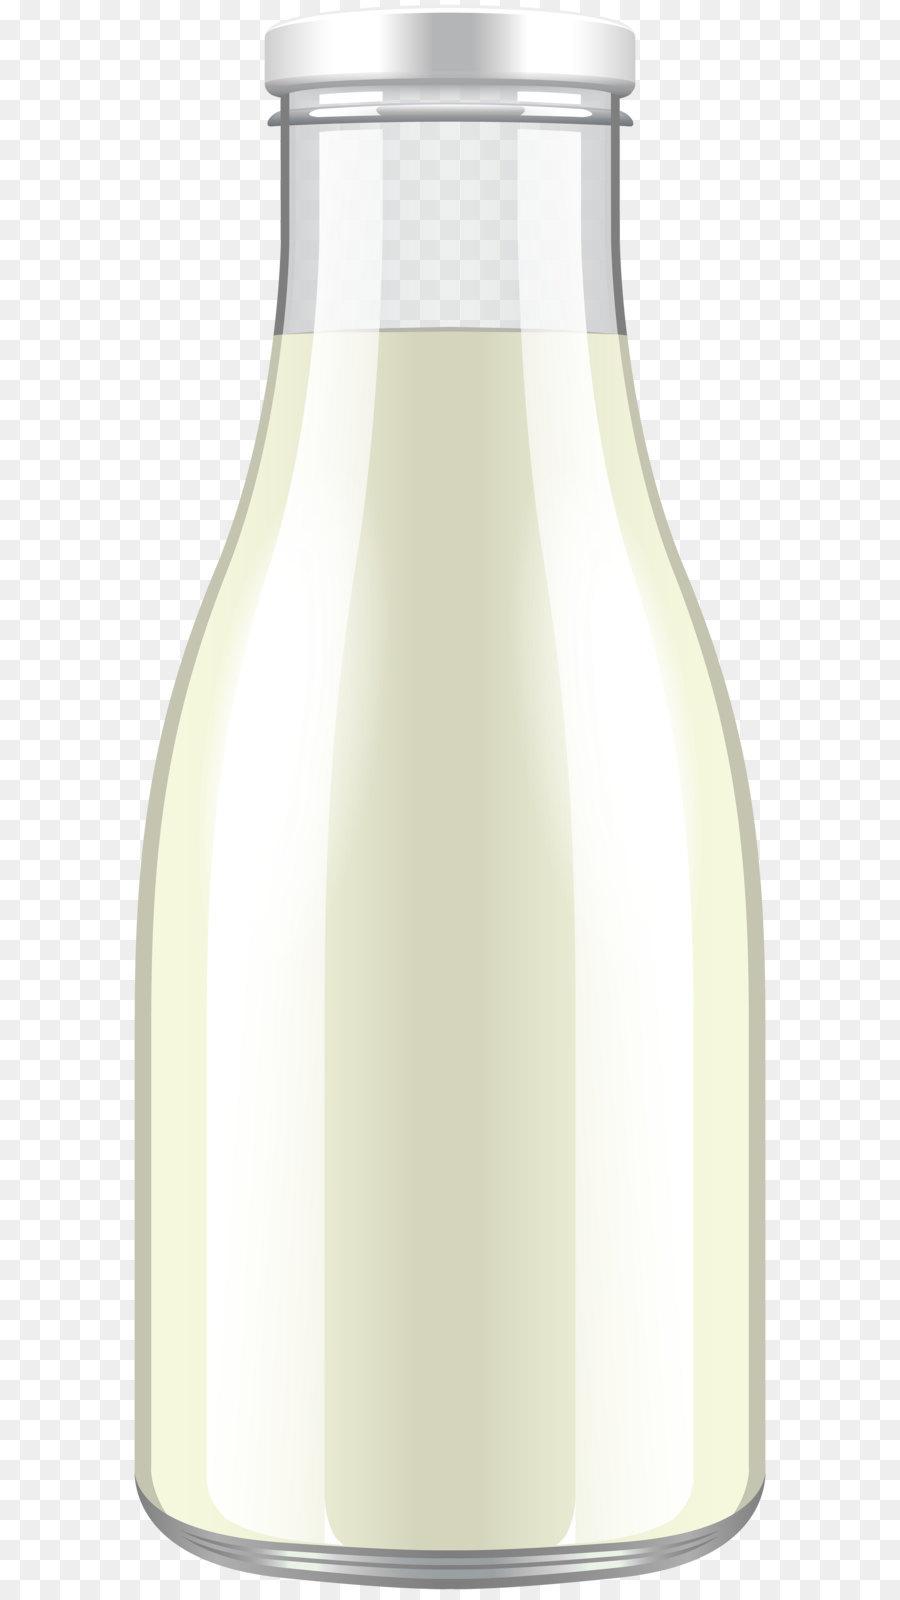 Of milk png clip. Bottle clipart glass bottle